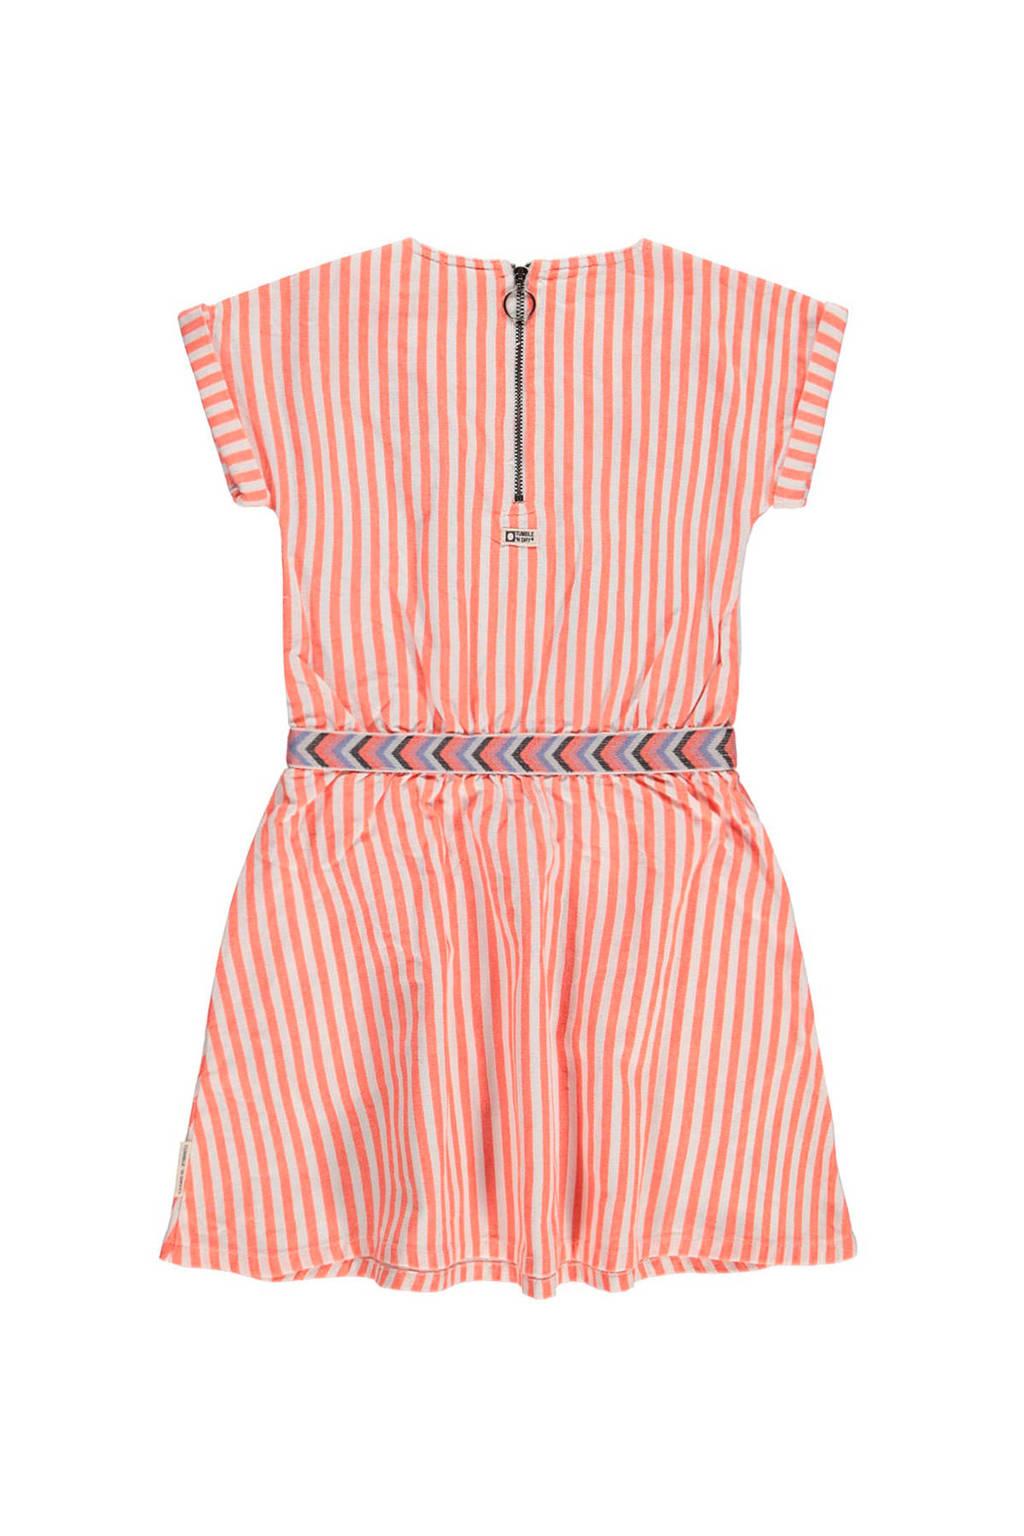 Tumble 'n Dry Mid gestreepte jersey jurk Lively oranje/ecru, Oranje/ecru